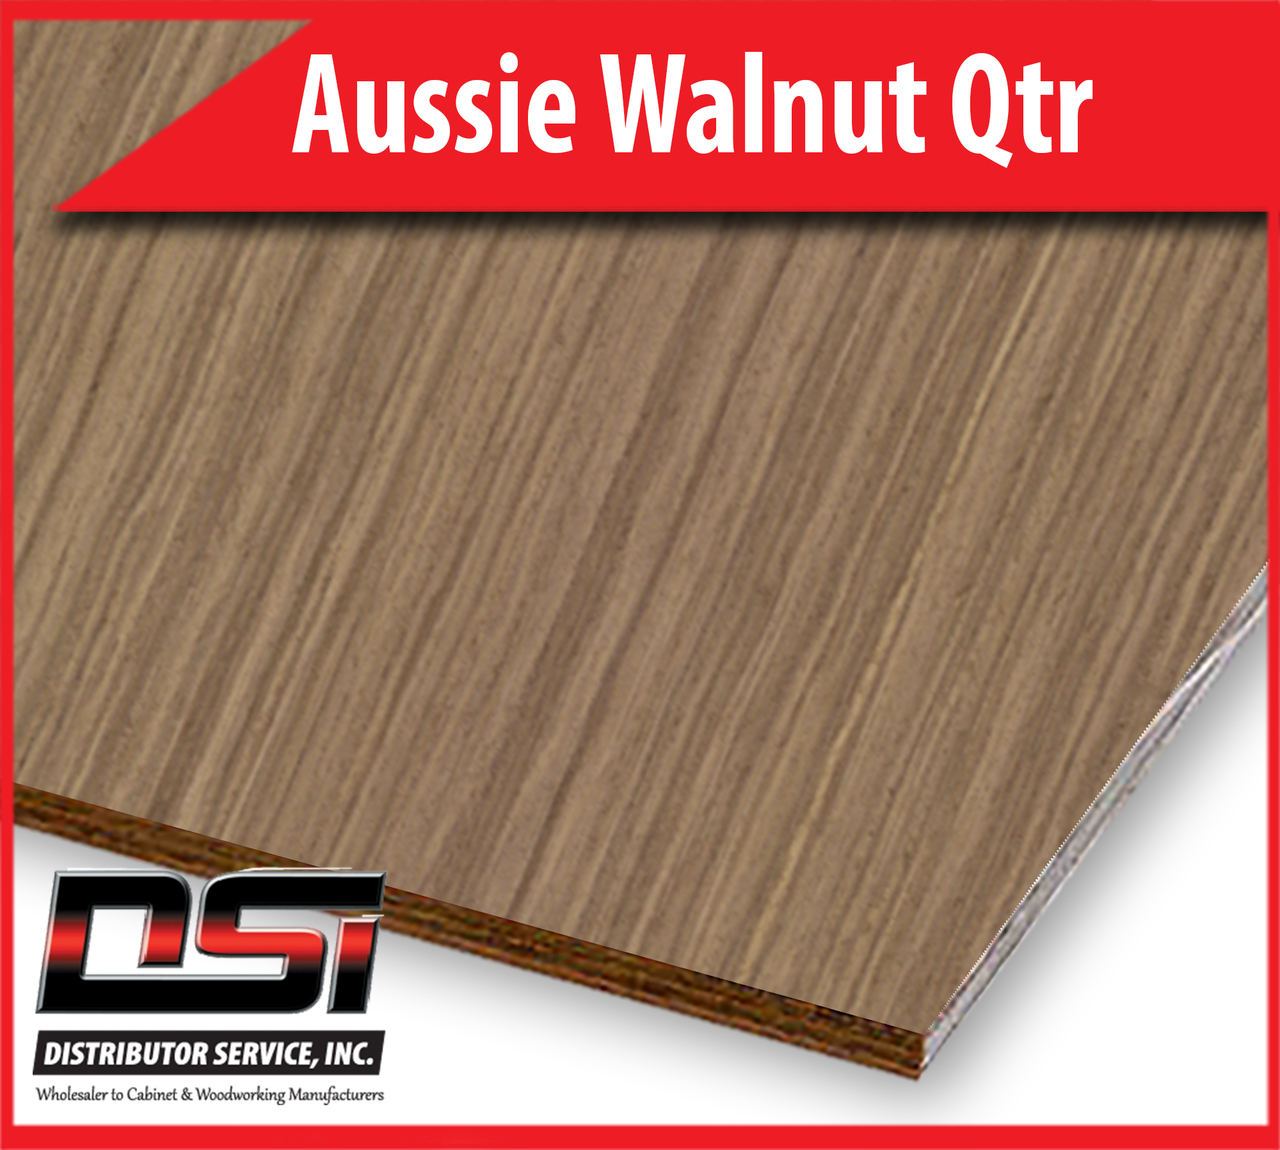 "Aussie Walnut Plywood Qtr A-A Pluma Ply VC 1/2"" x 4x8"